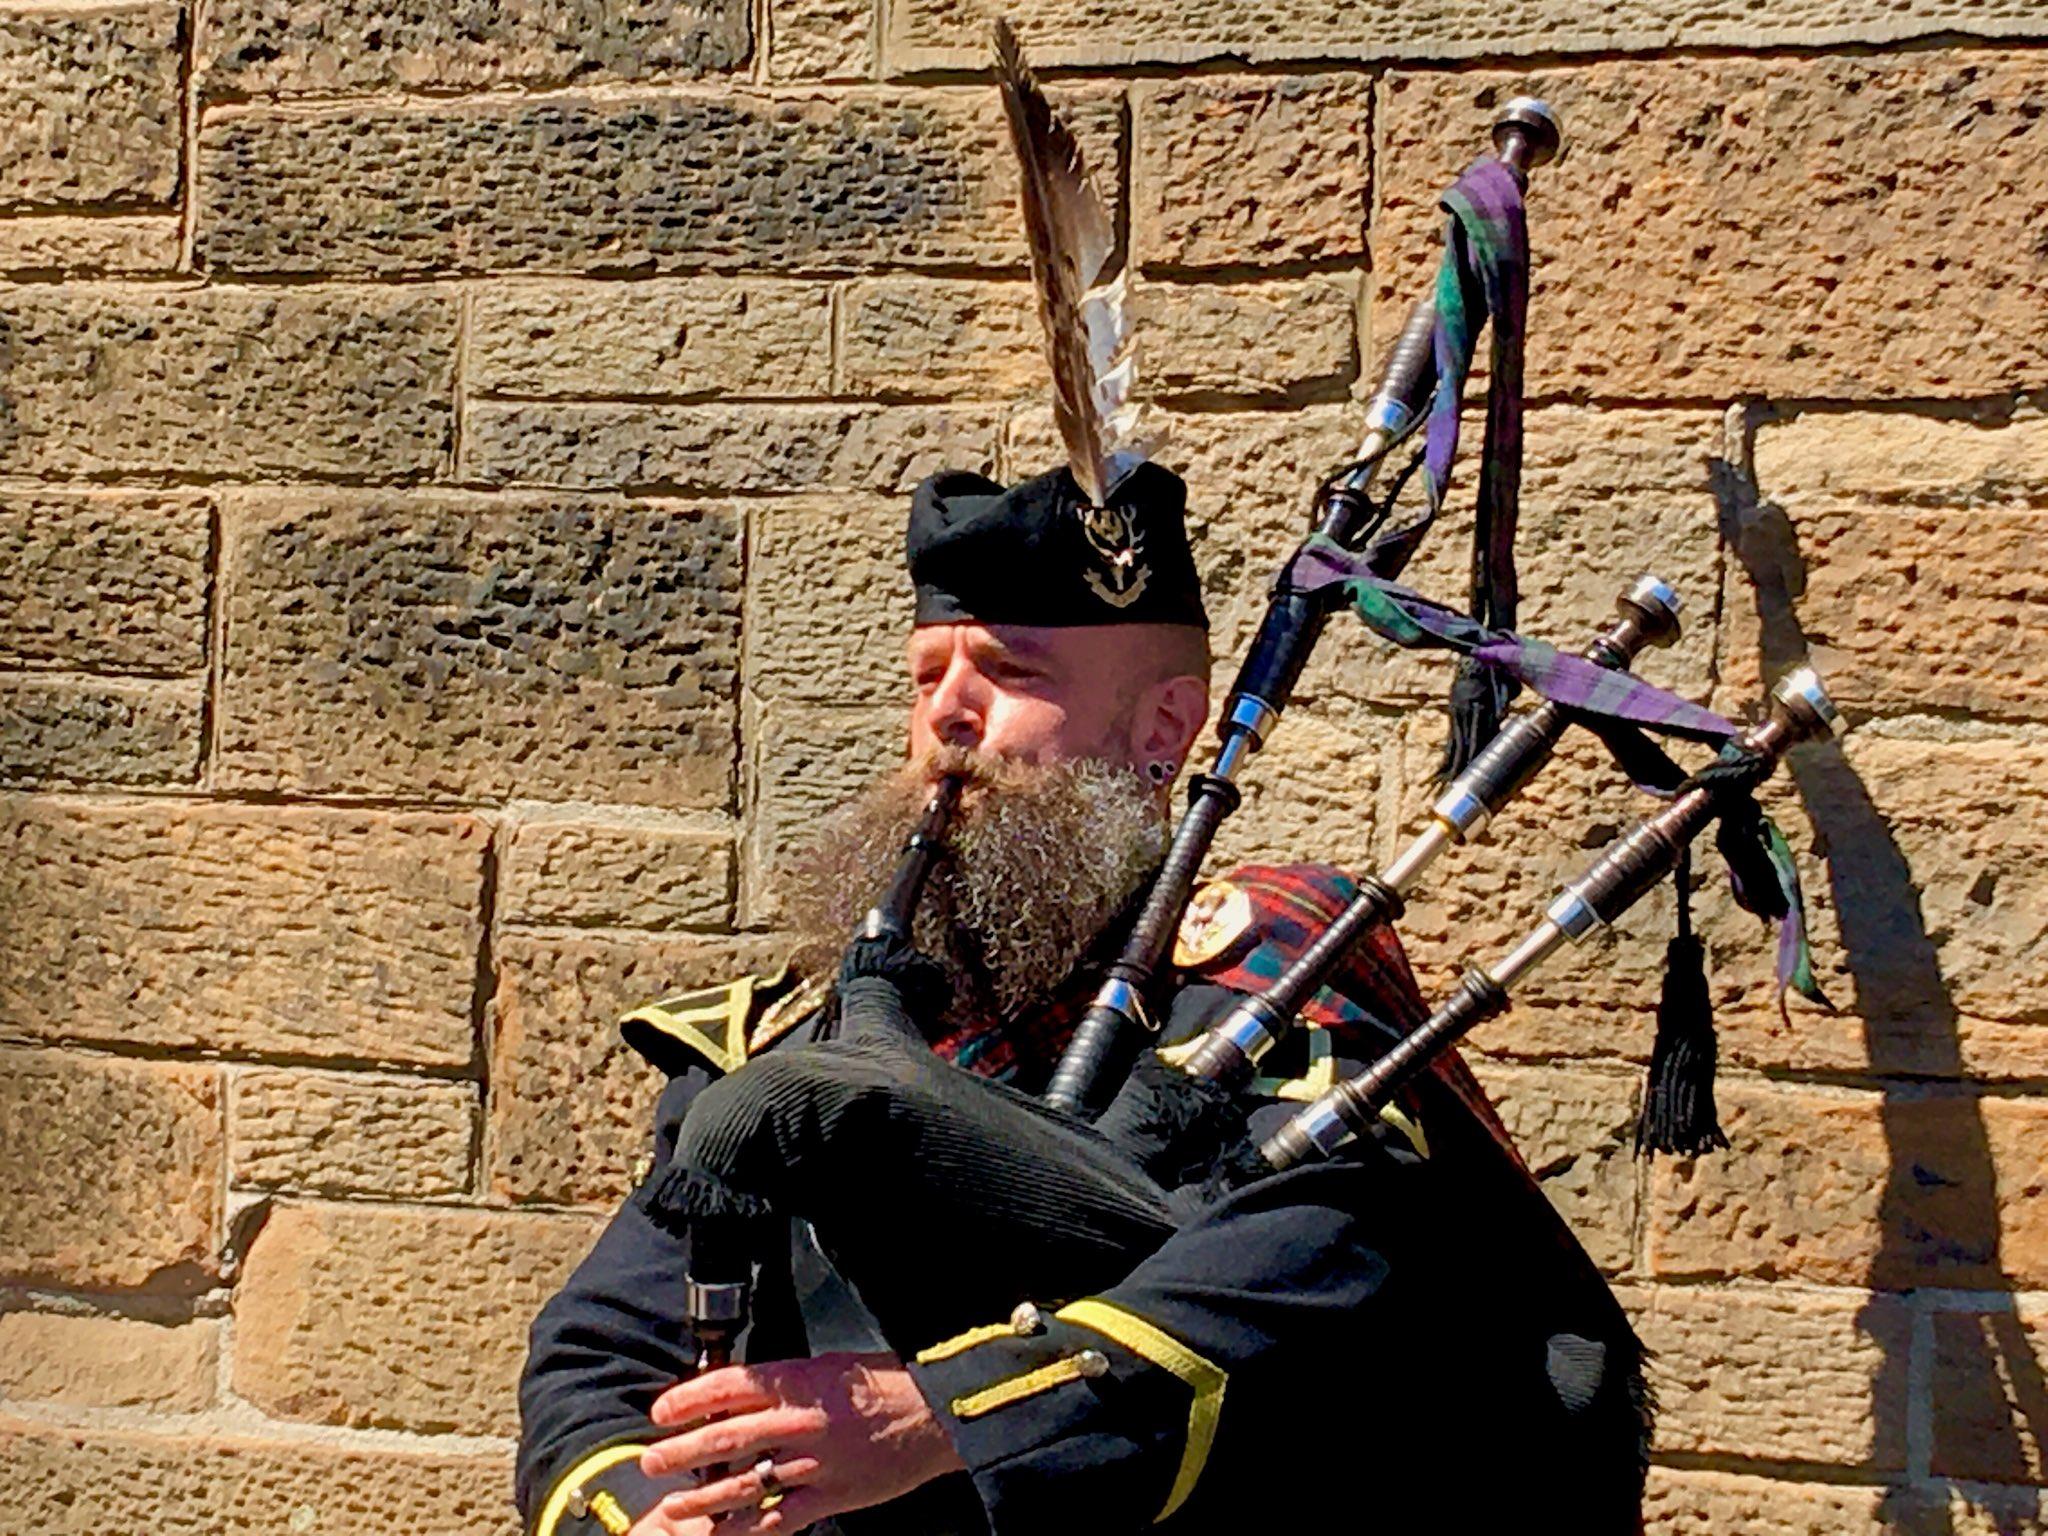 Odyssey Scotland 2018, Bagpiper in front of Edinburgh Castle. https://t.co/79cUaQ9WW0